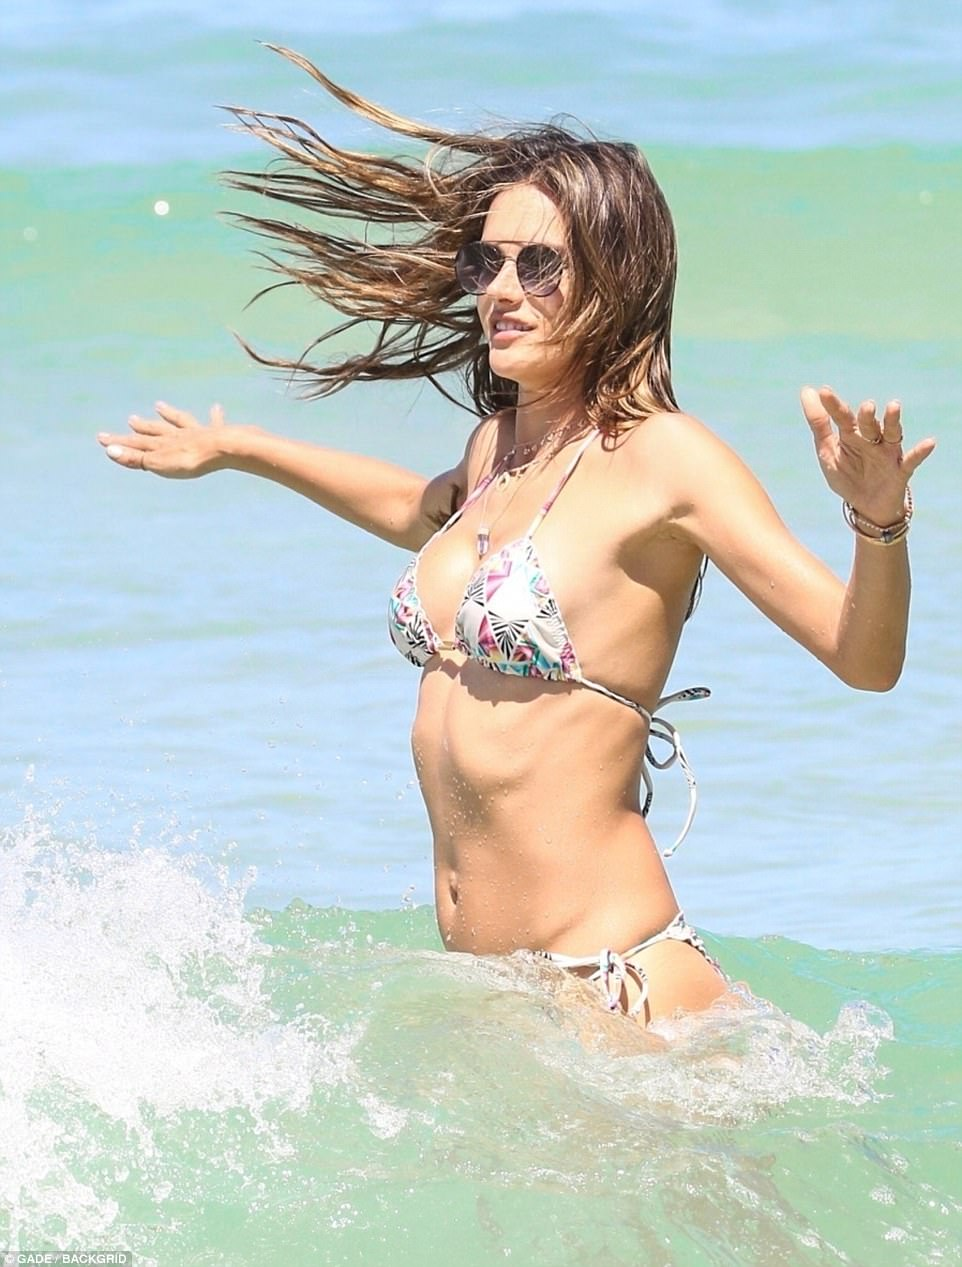 Alessandra Ambrosio In A Skimpy Patterned Bikini